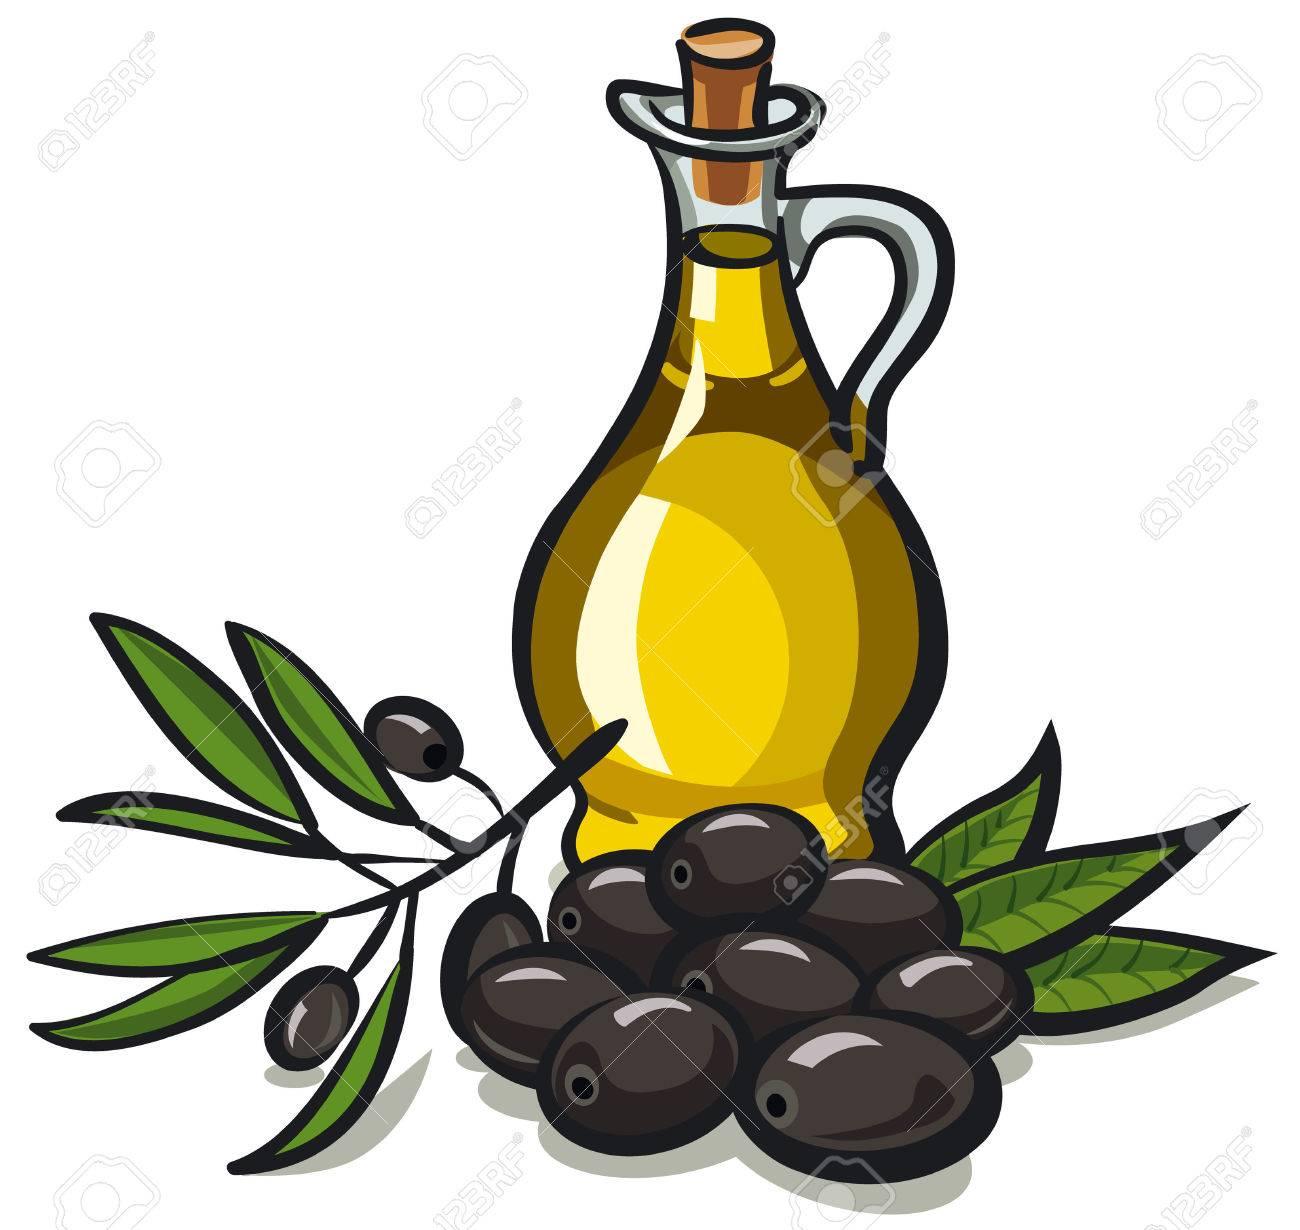 olive oil - 44787421